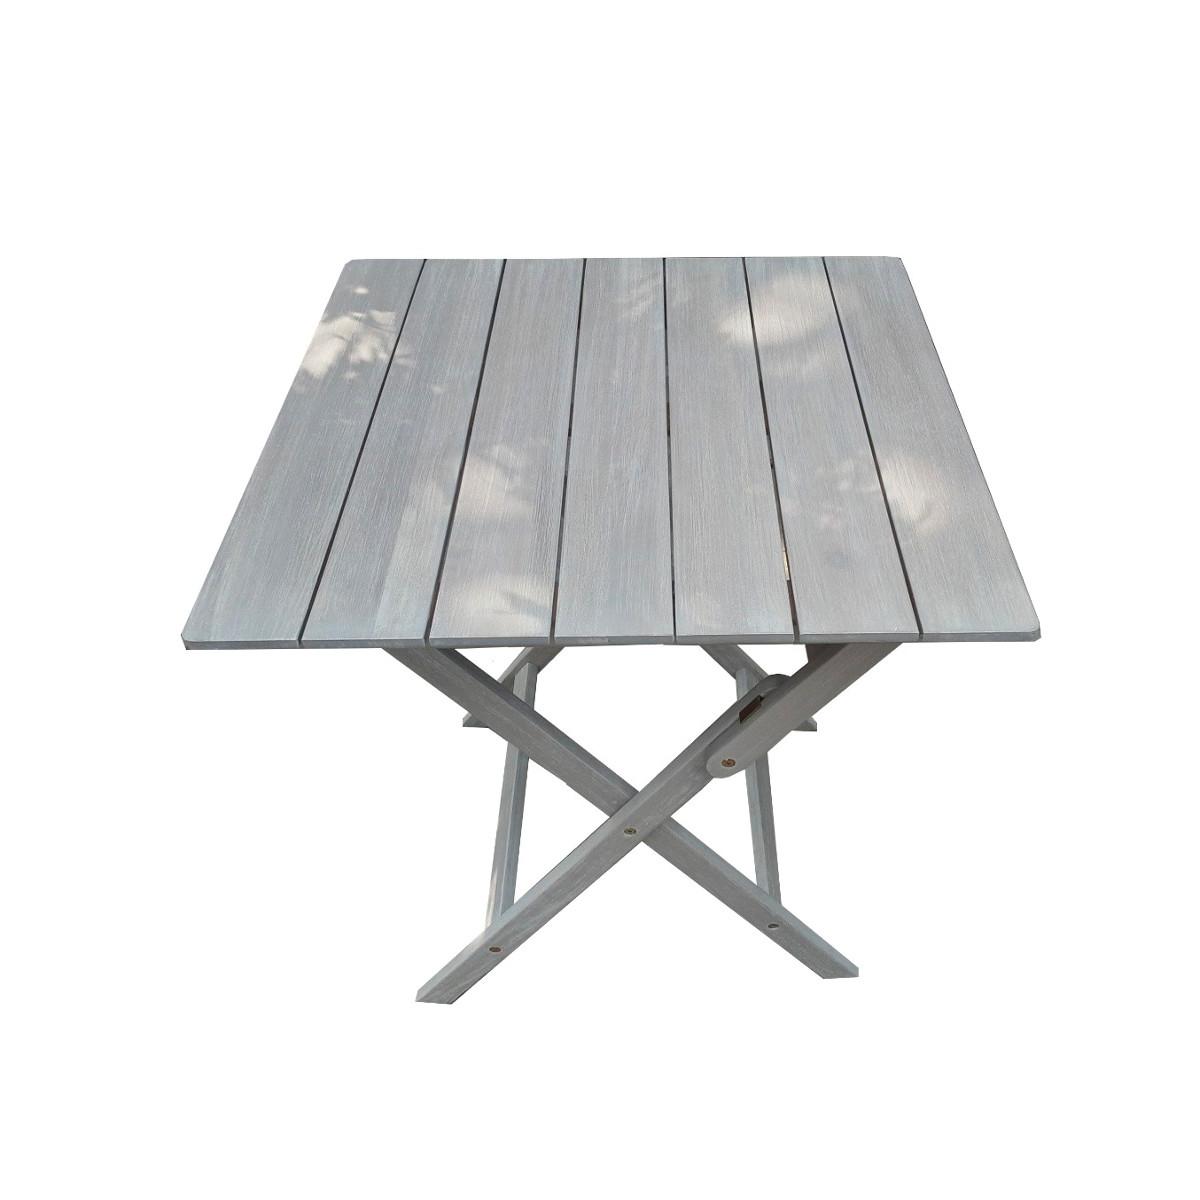 Sedie da giardino leroy merlin caminetti da esterno leroy for Tavoli da esterno leroy merlin